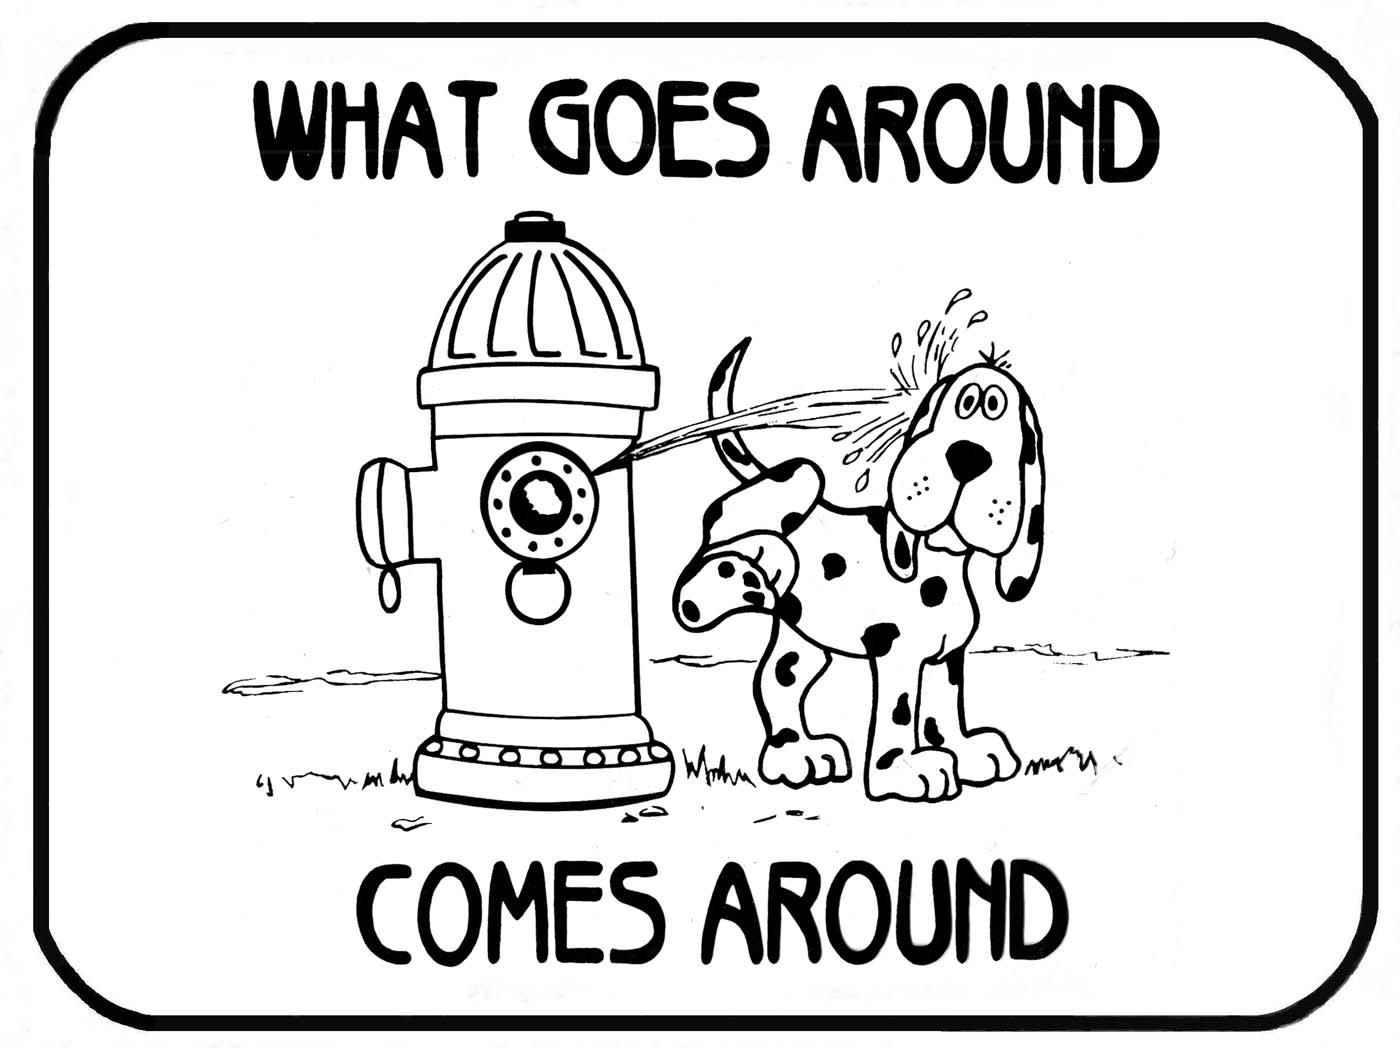 What goes around come around